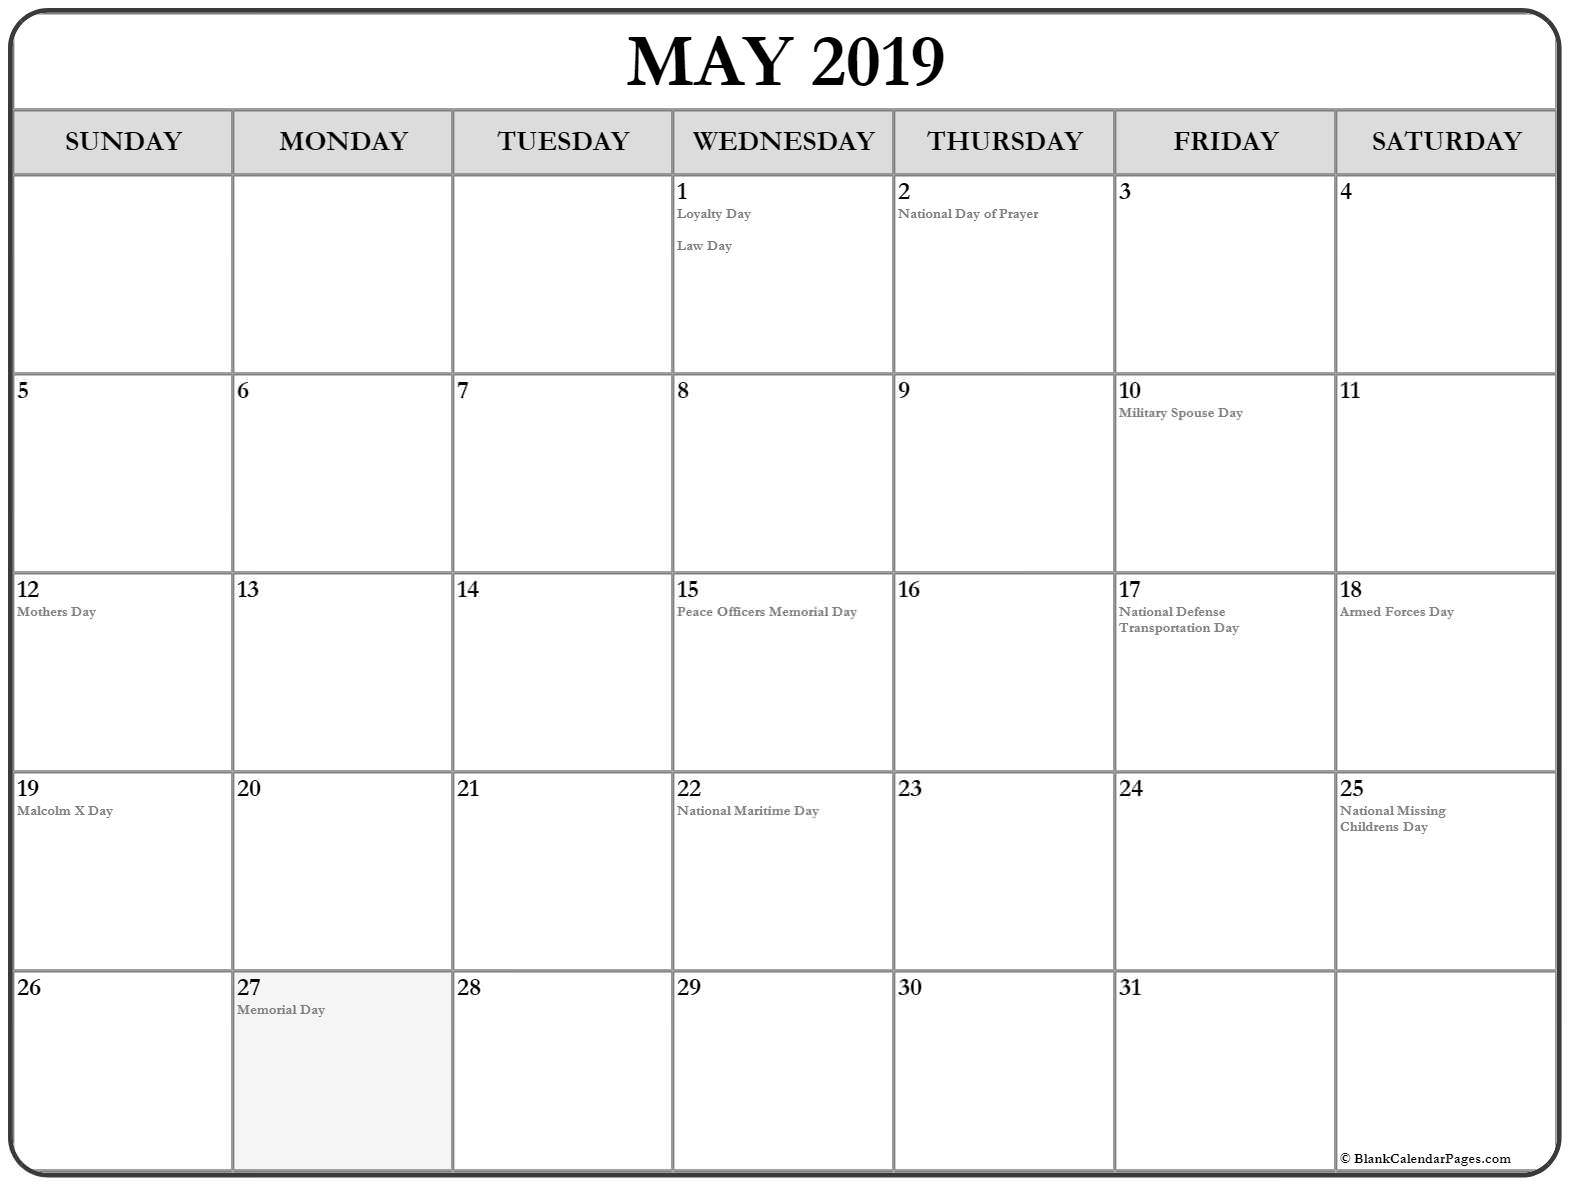 May 2019 Holidays Calendar Template - Free Printable